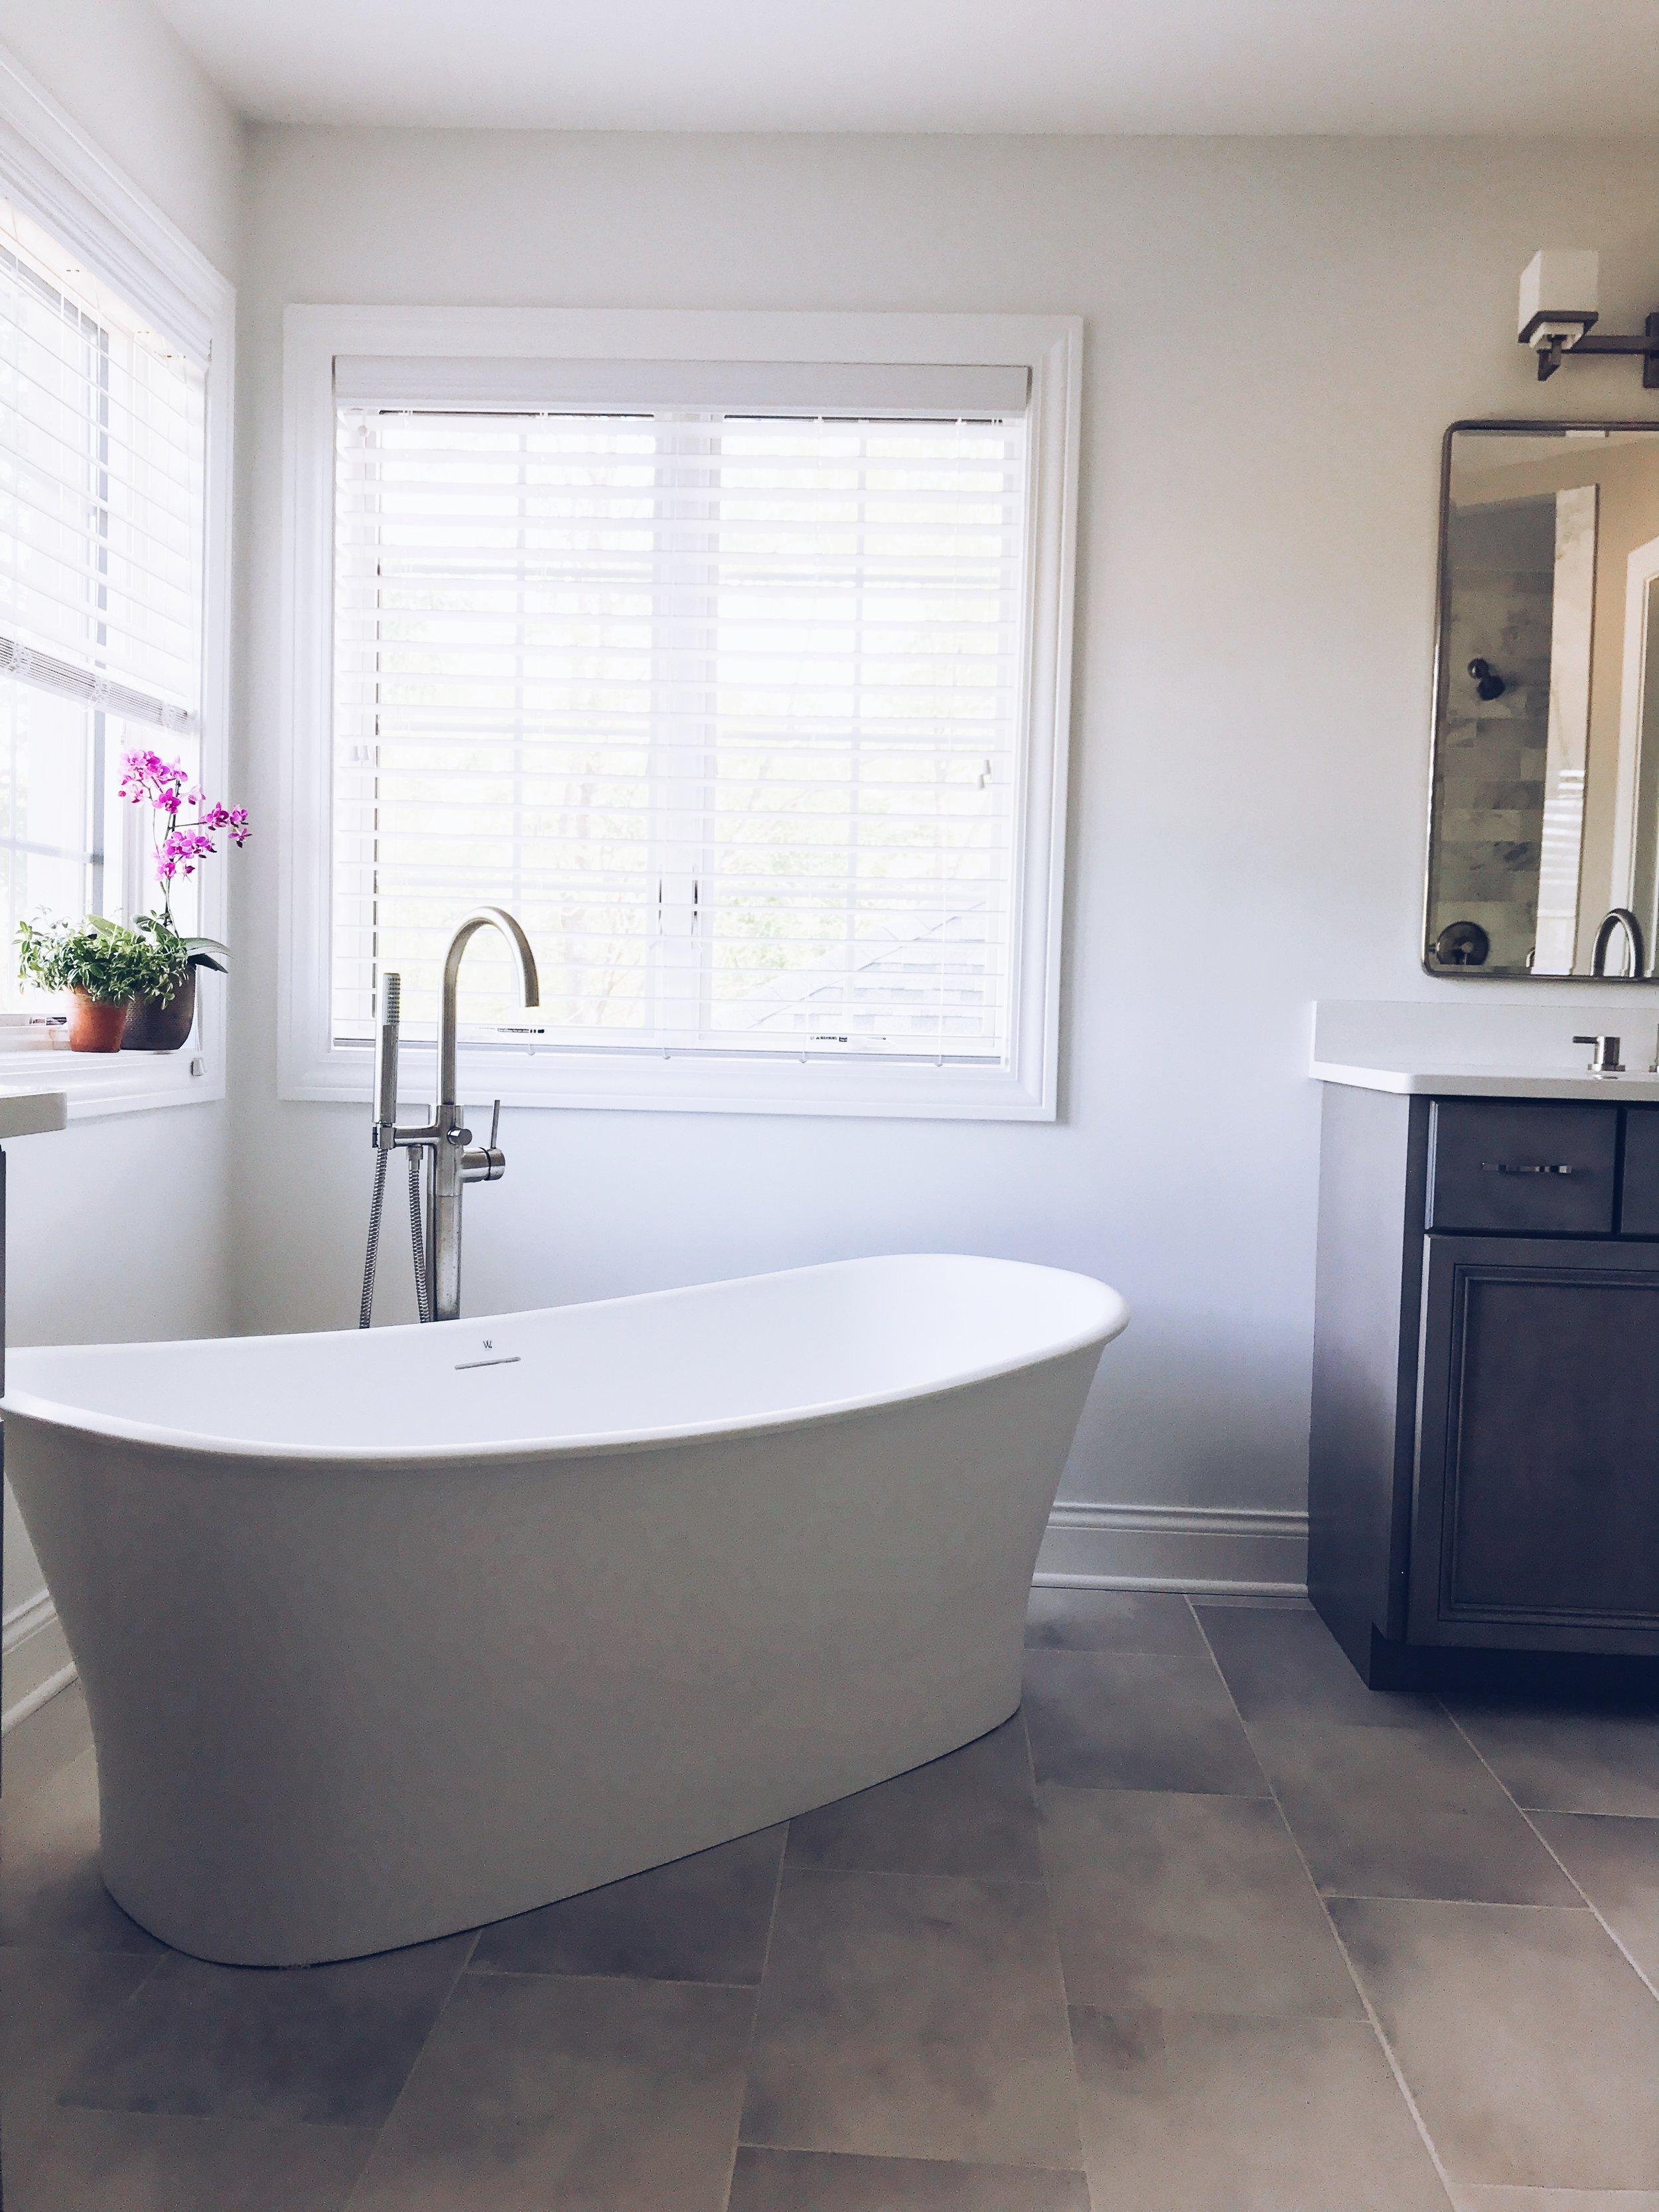 WETSTYLE Cloud Collection Freestanding Bathtub. White Modern Bathtub. Bath tub ideas. Soaking tubs. Contemporary Bathtub ideas. #wetstyle #sponsored #contemporary #modern #freestanding #bathtub